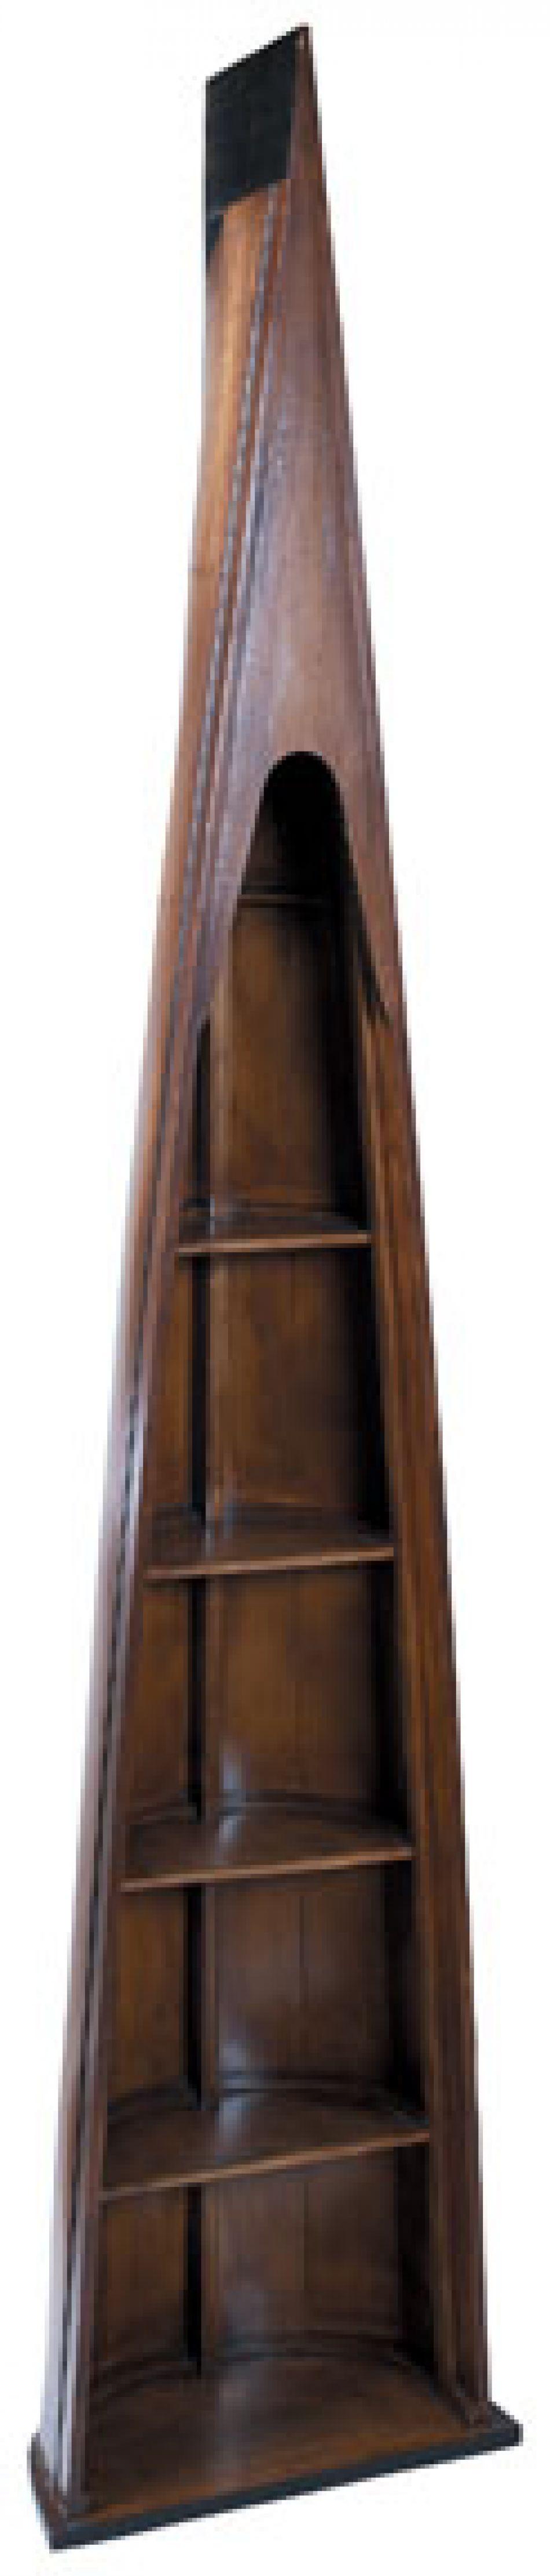 Buy Canoe Bookcase 86 Inch Beach House Decorating Ideas